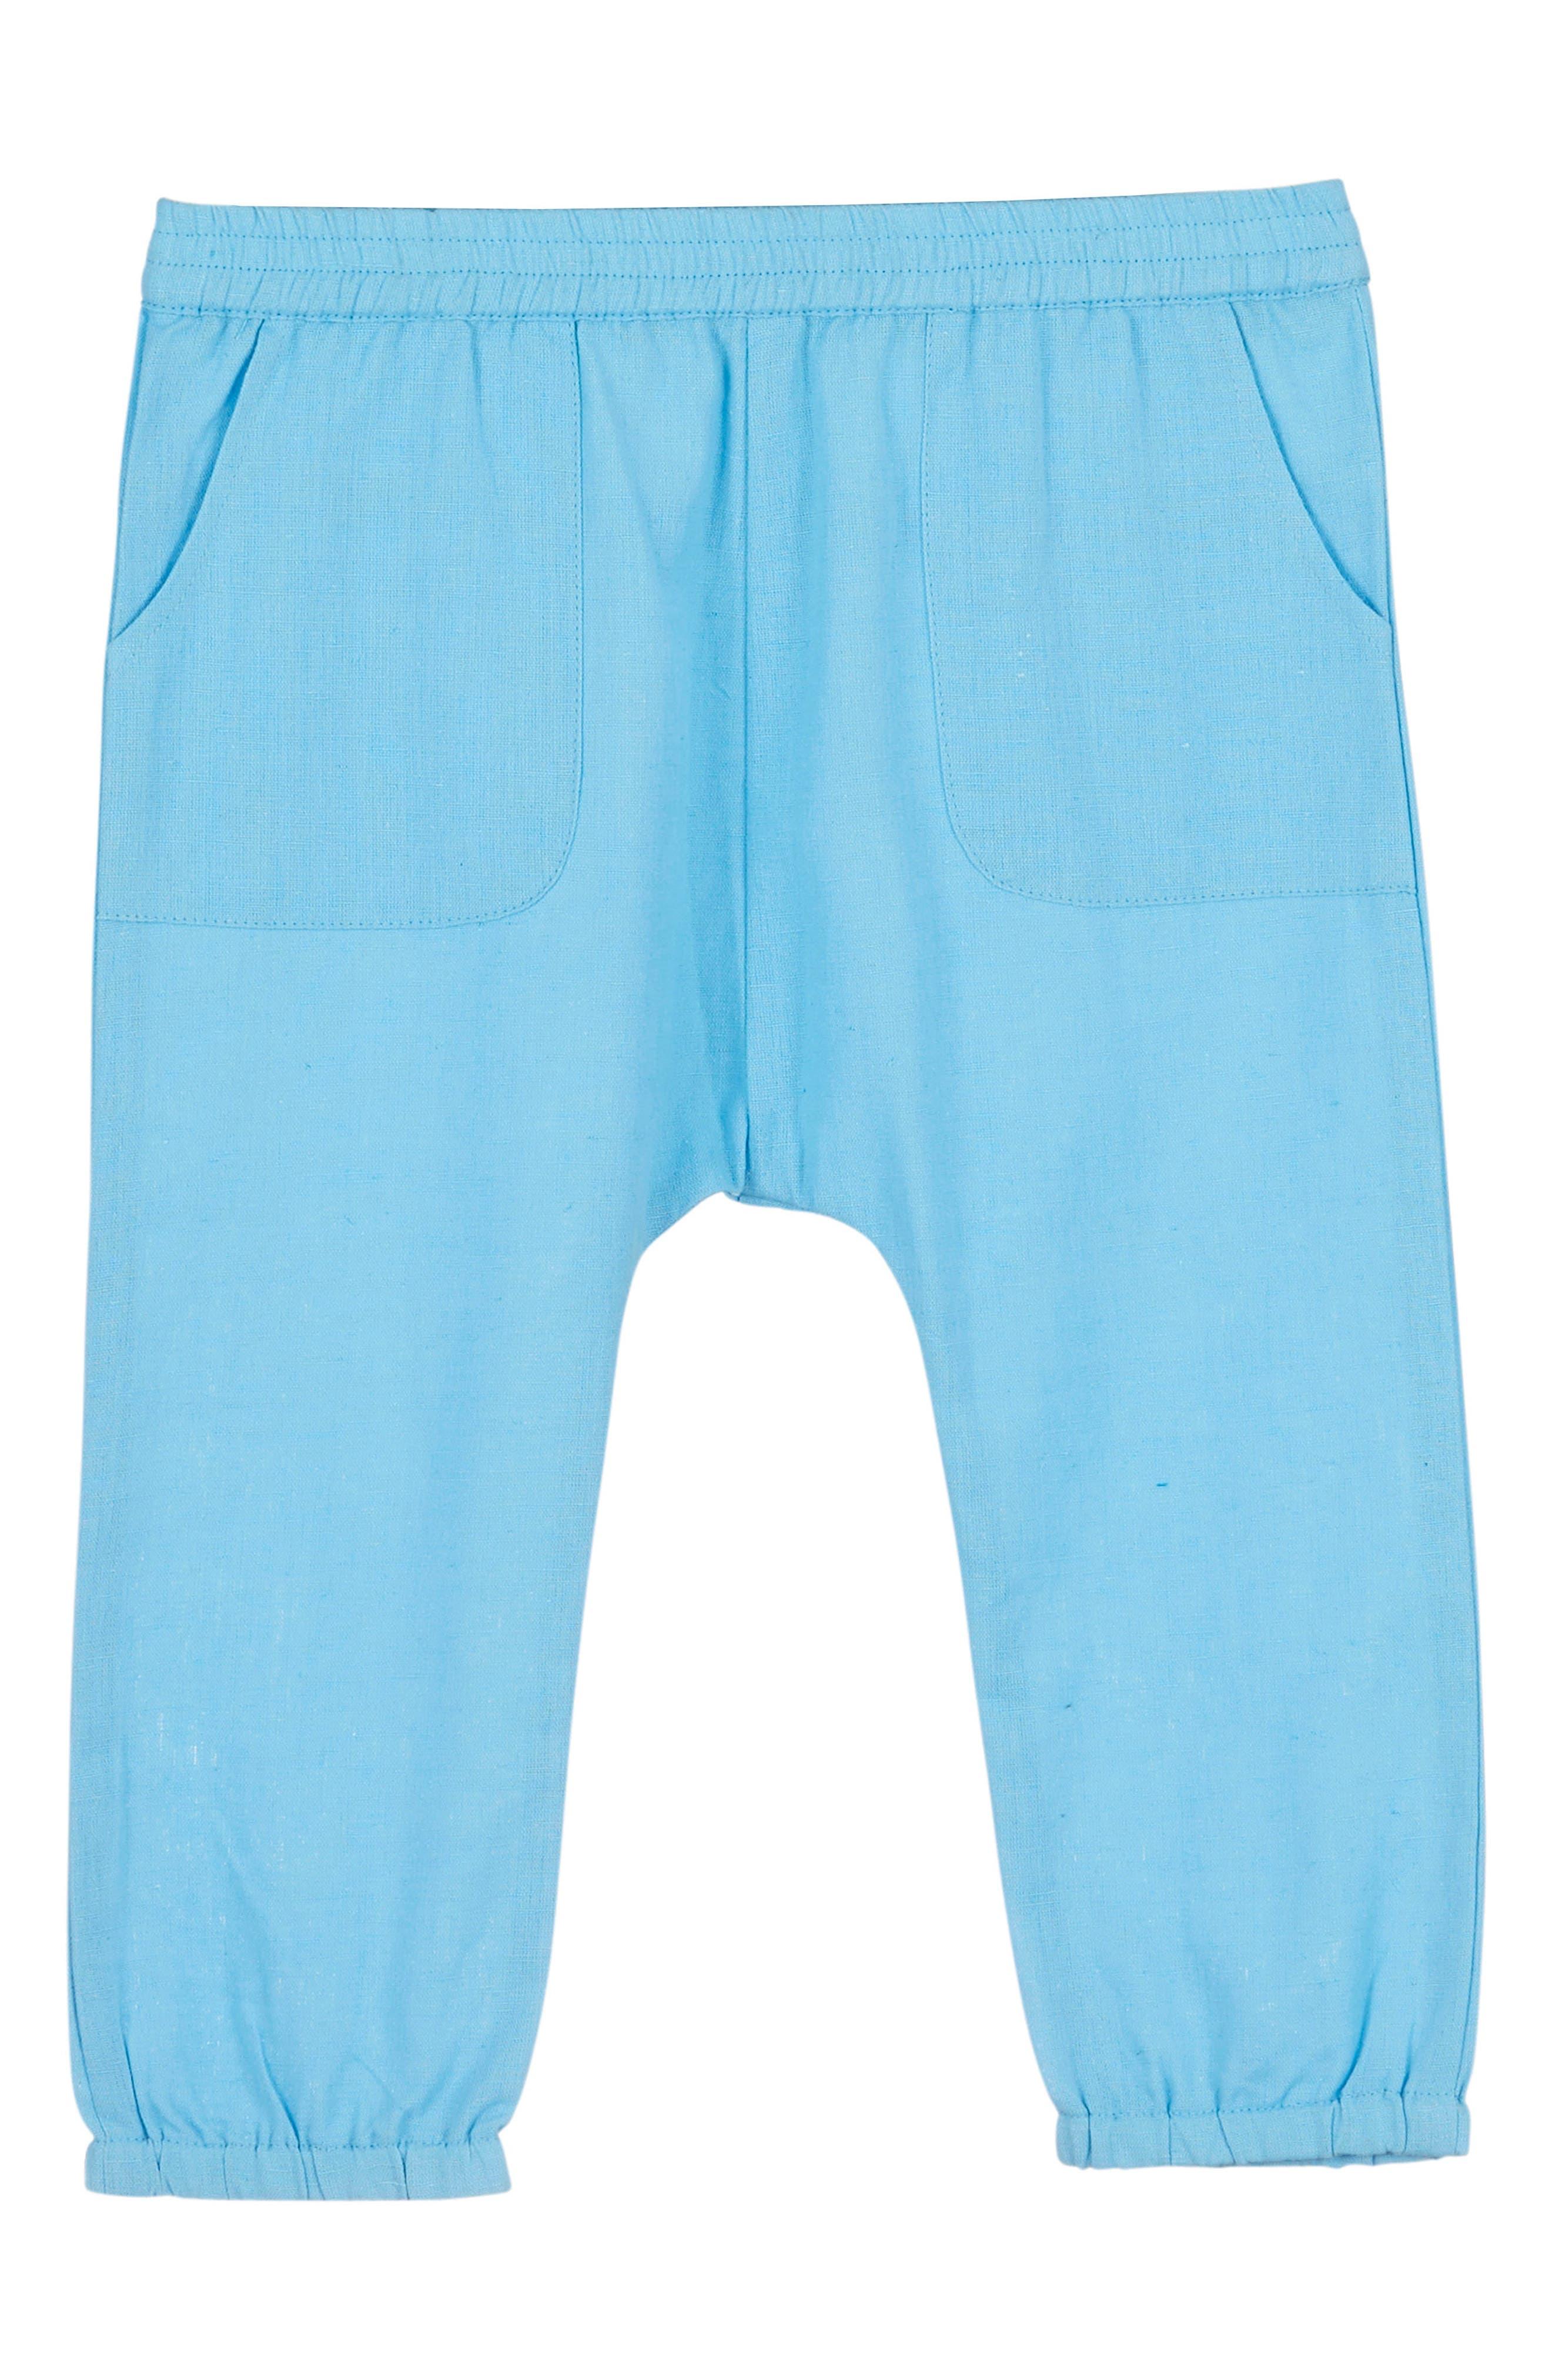 Harem Pants,                         Main,                         color, Heritage Blue